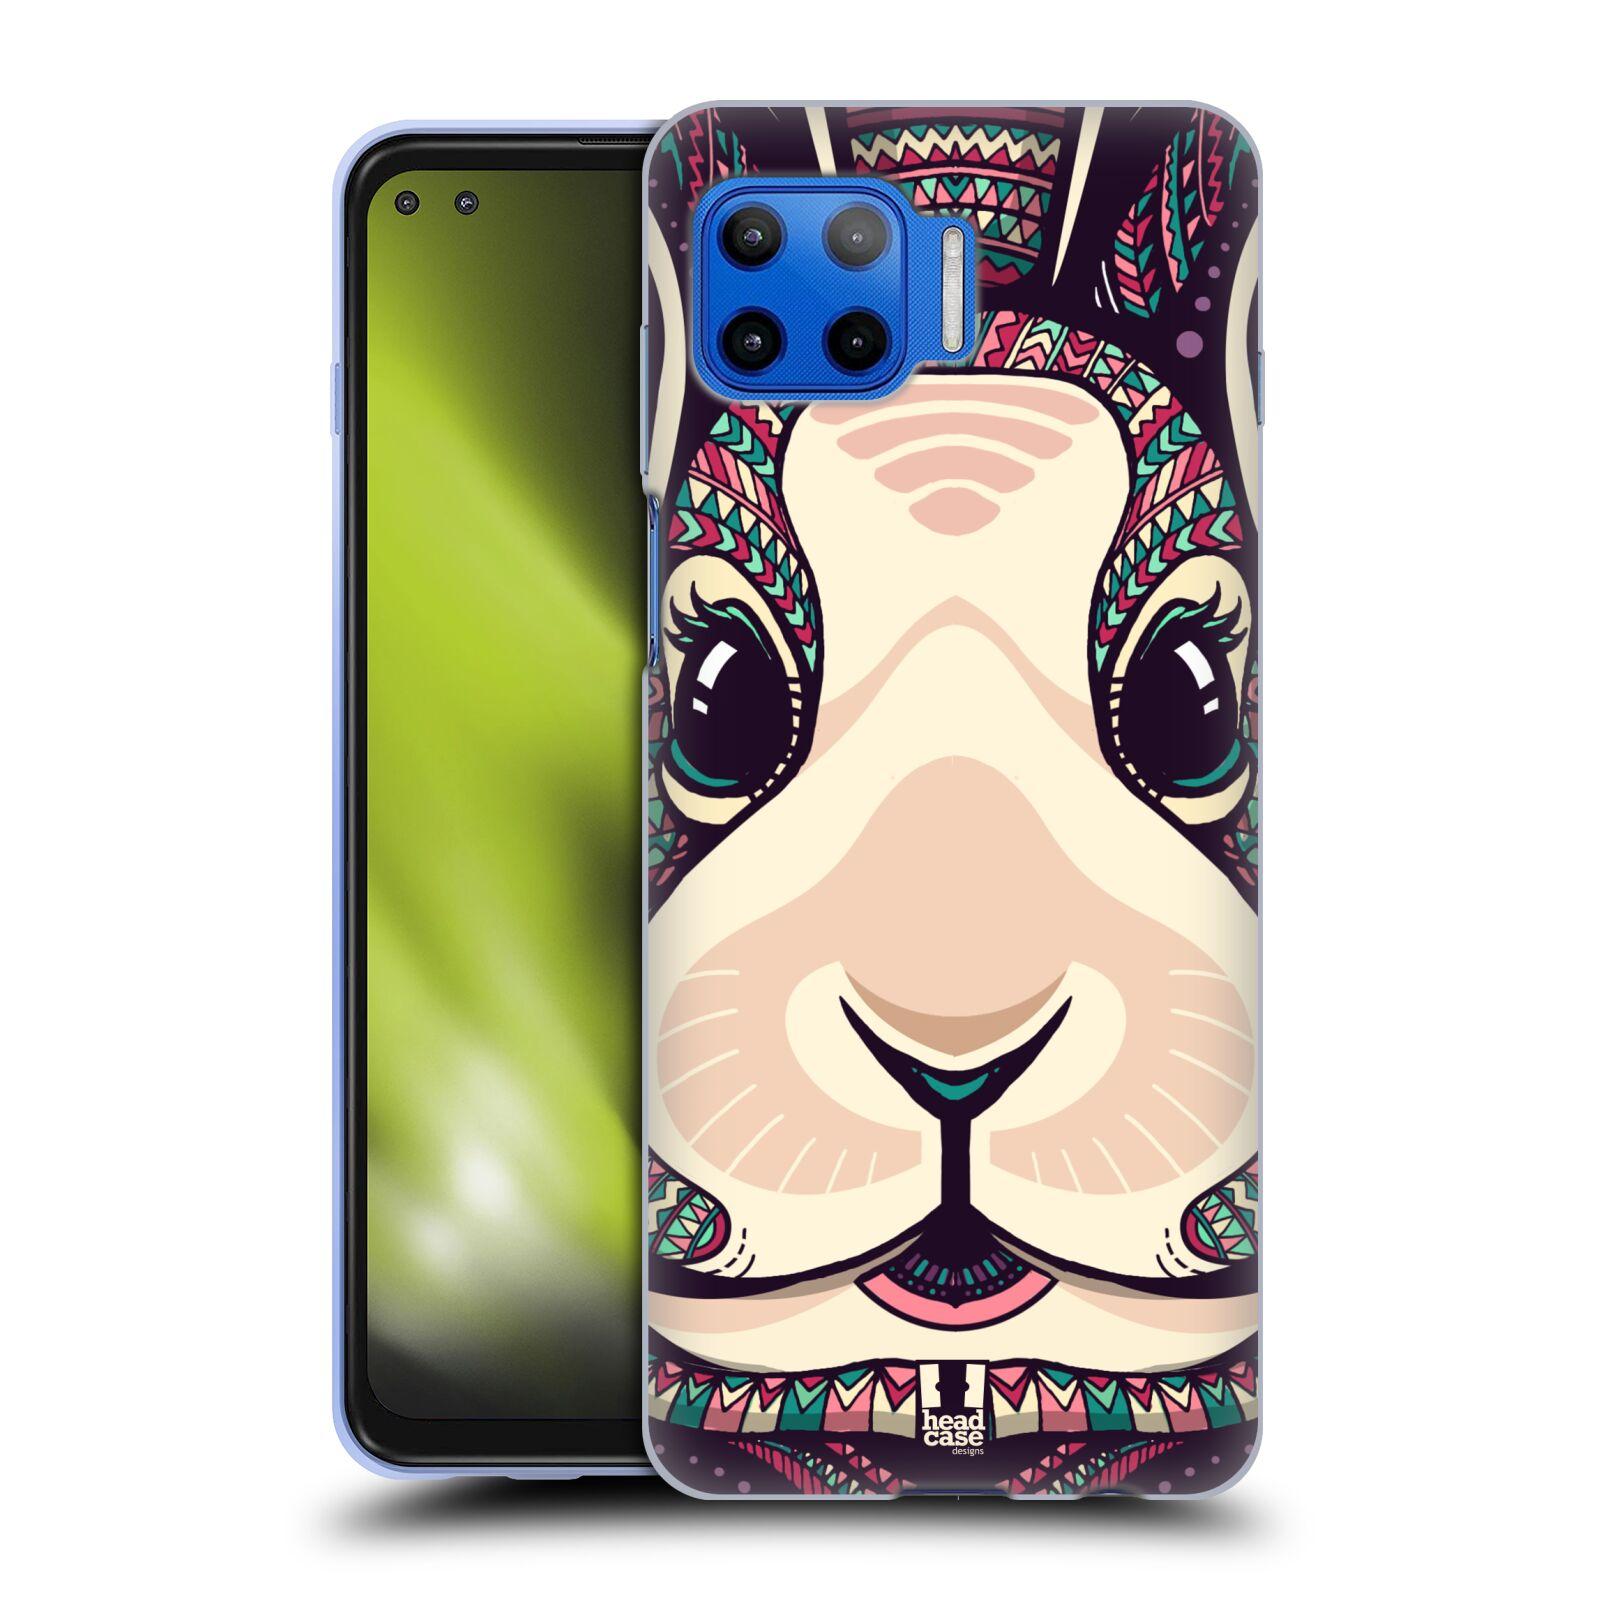 Silikonové pouzdro na mobil Motorola Moto G 5G Plus - Head Case - AZTEC ZAJÍČEK